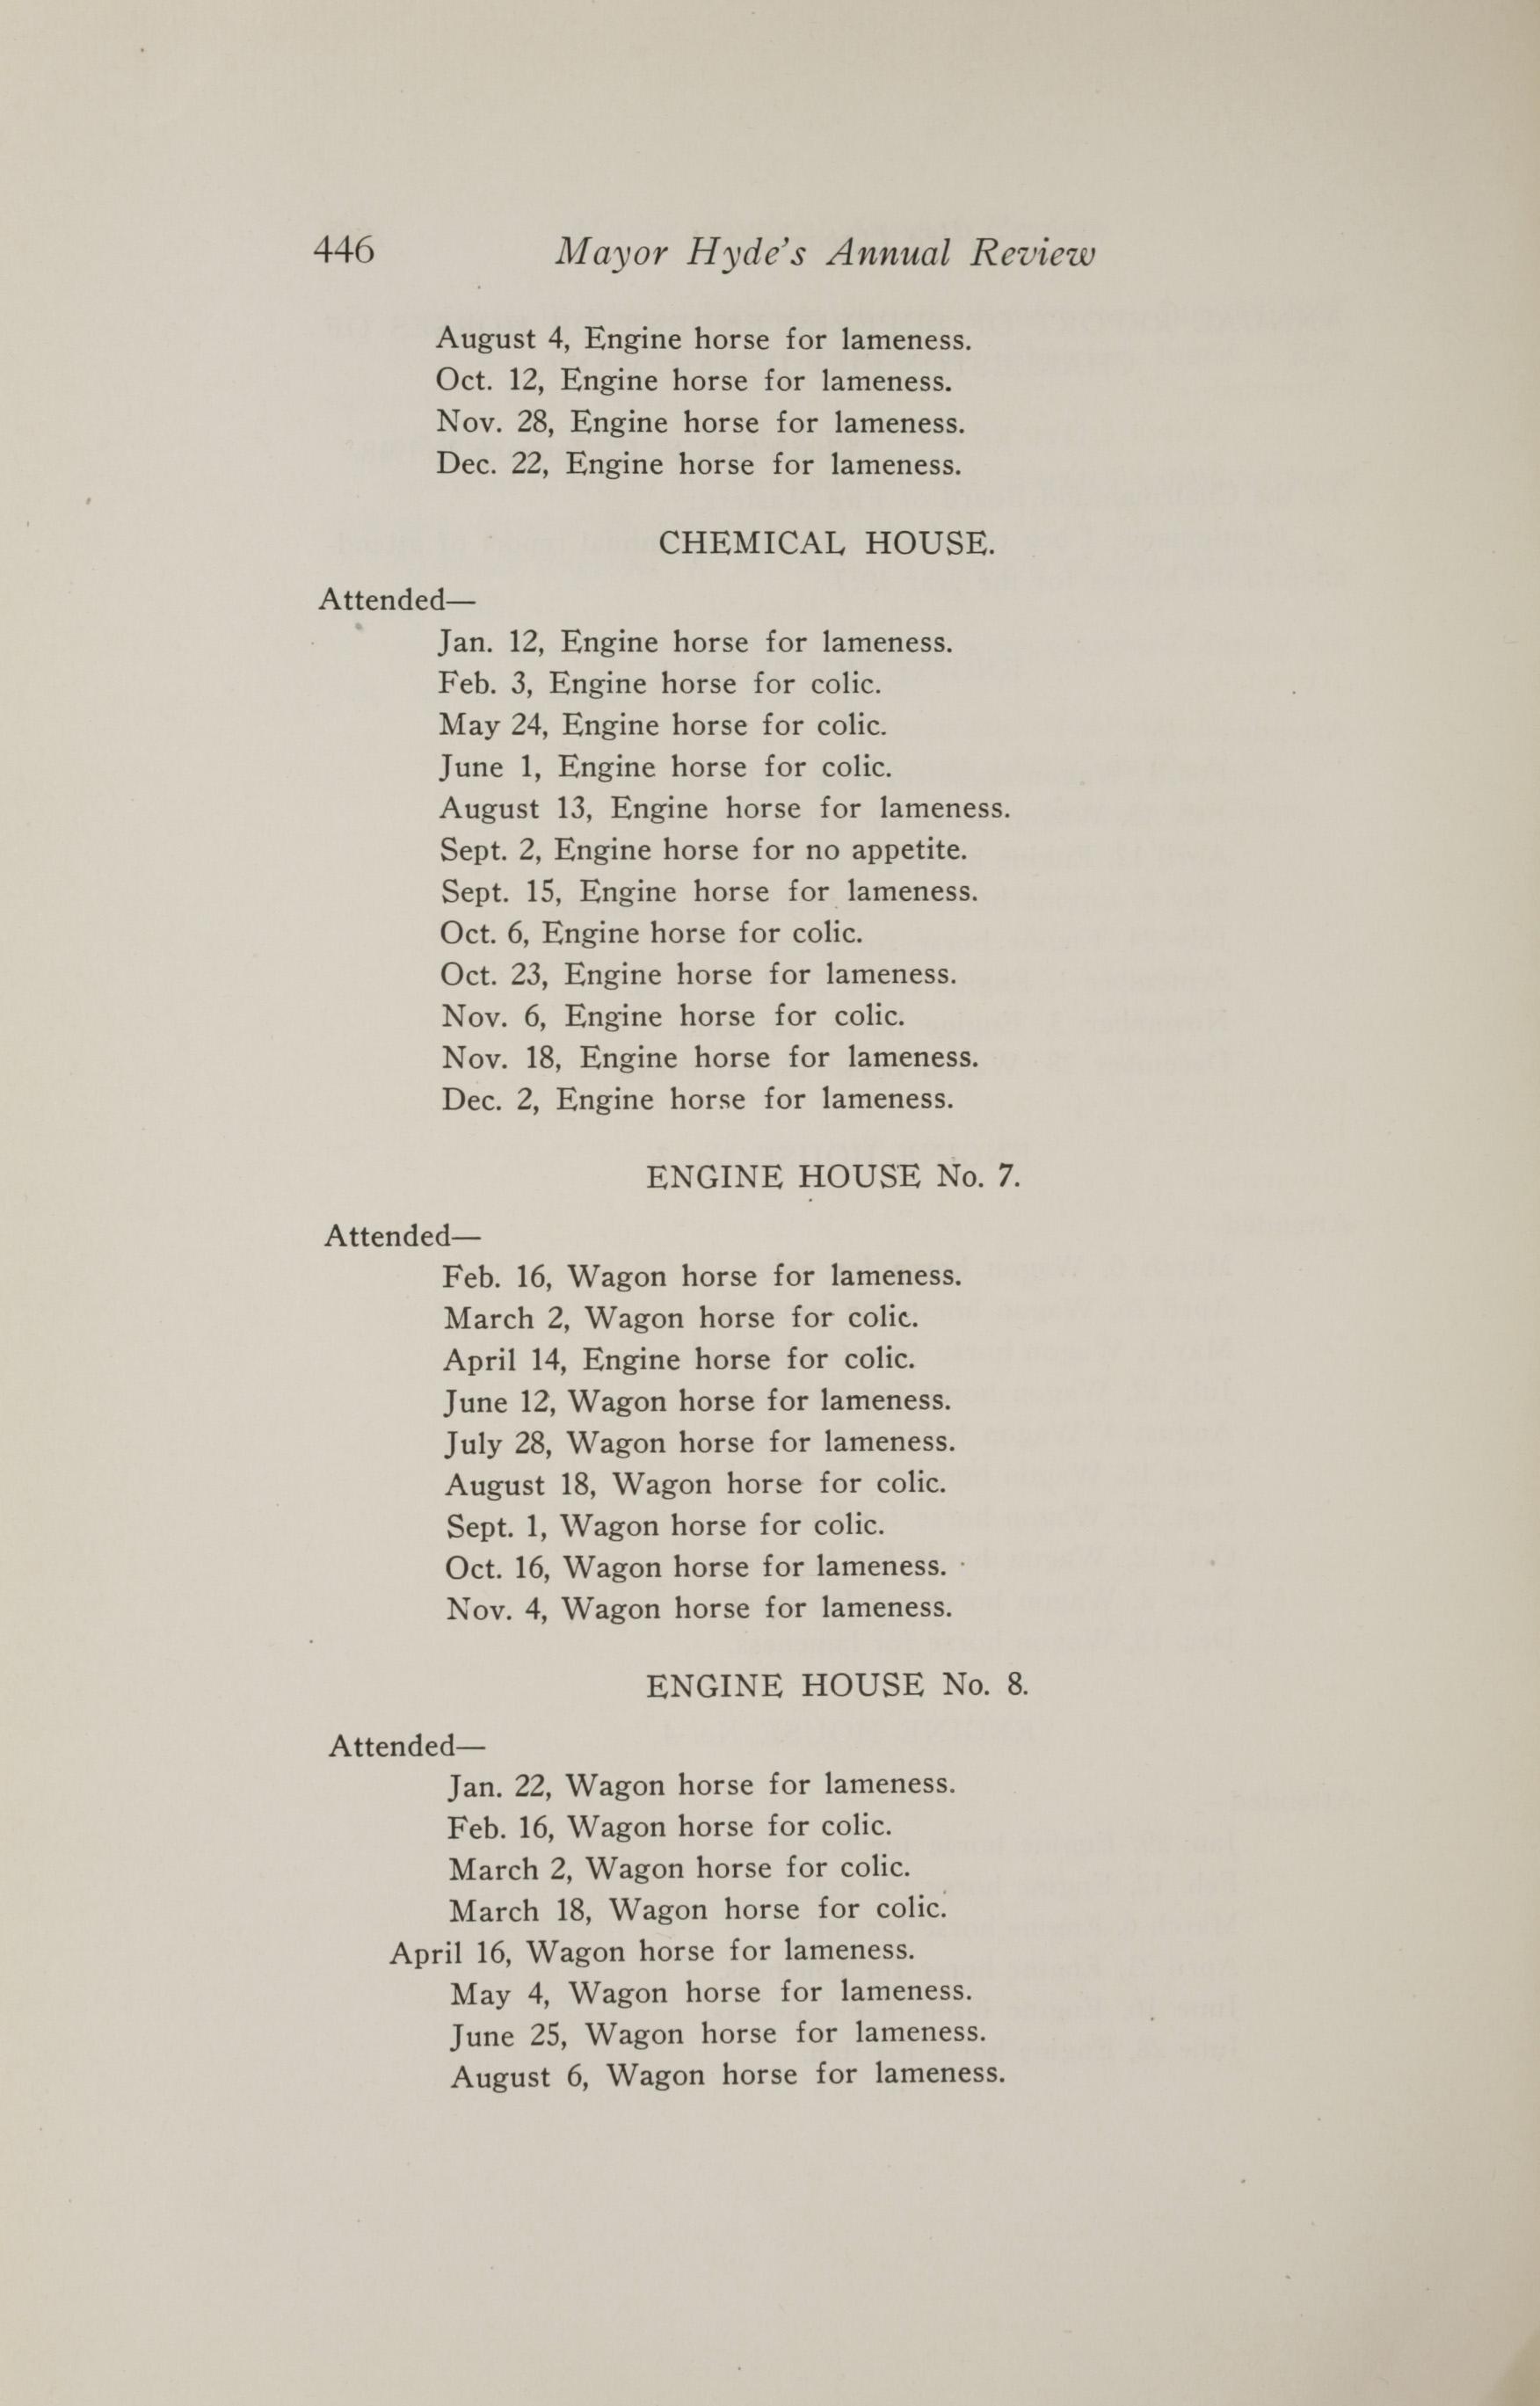 Charleston Yearbook, 1917, page 446